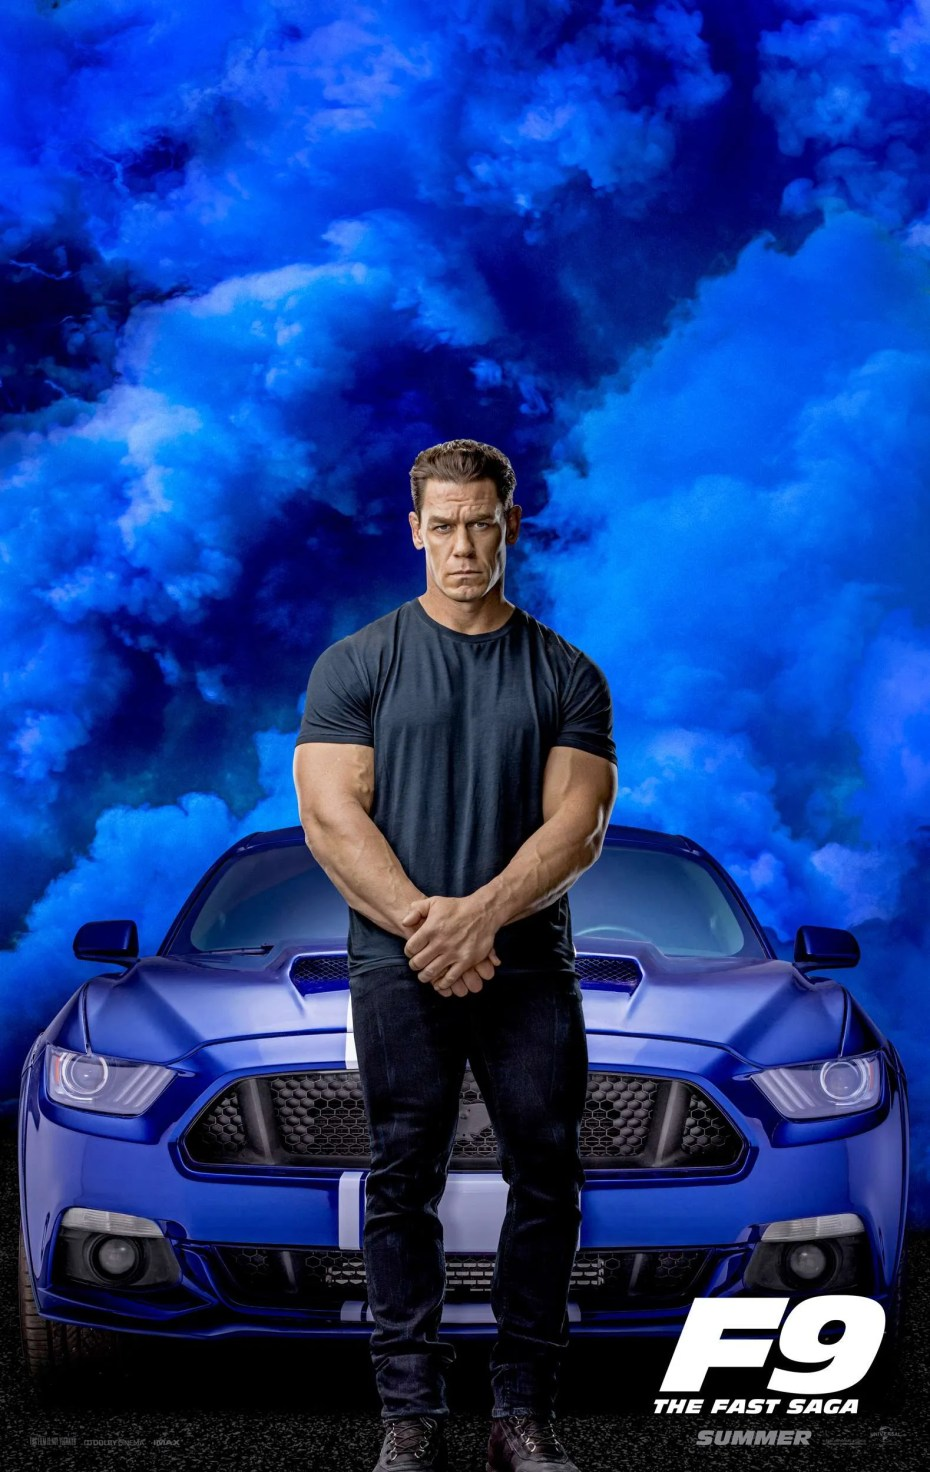 fast-and-furious-9-john-cena-poster